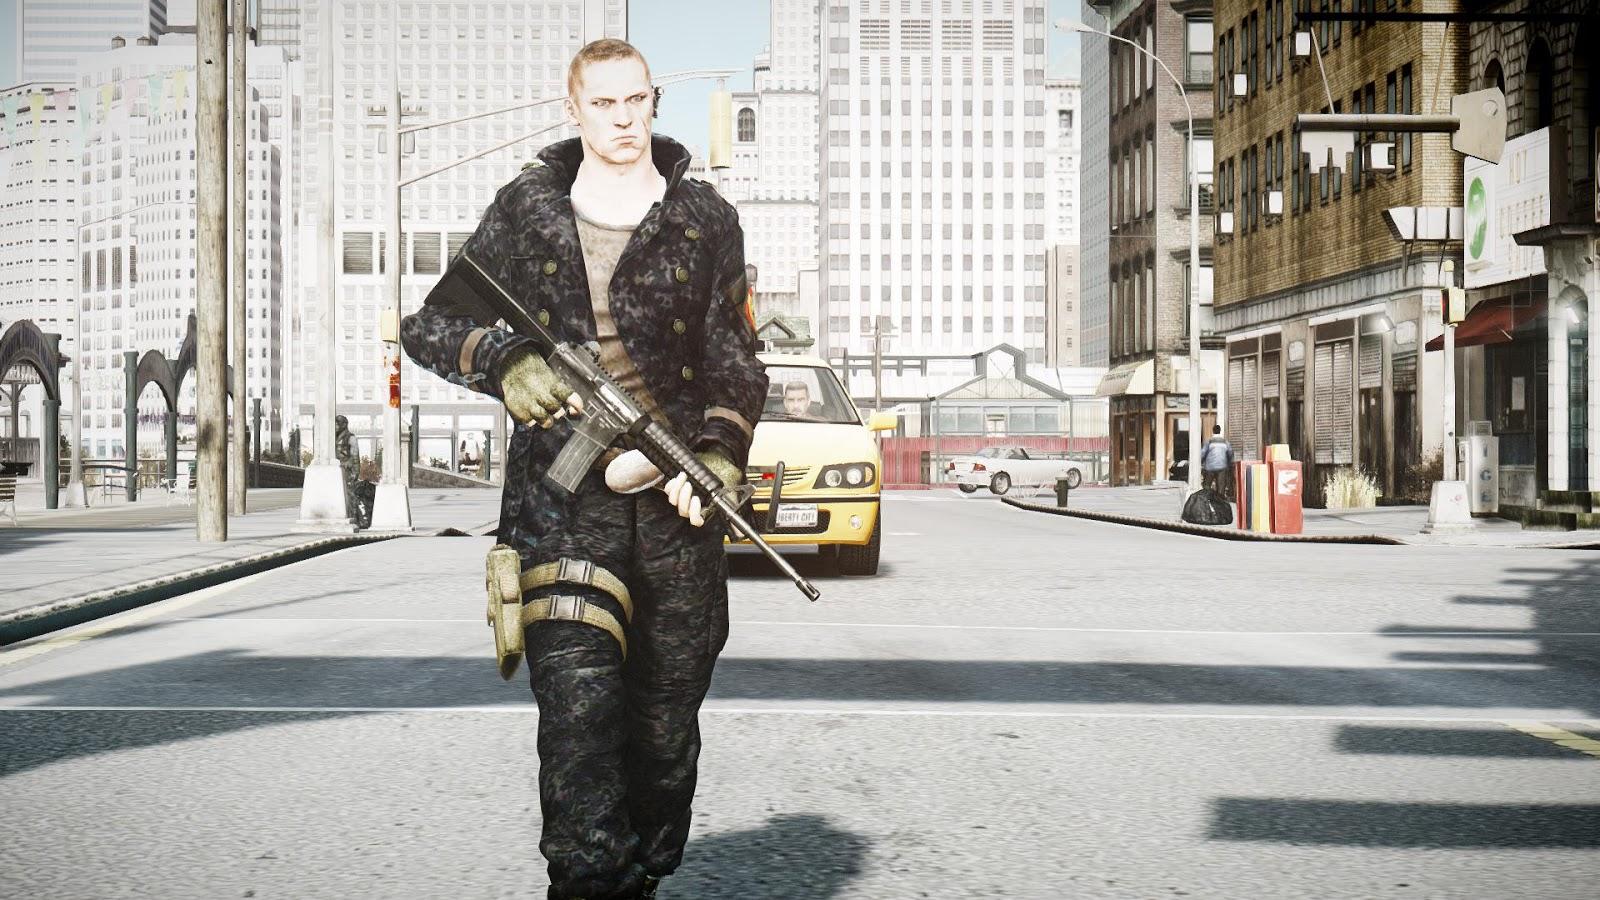 GTA 5,GTAV,GTA IV Mods and Skins: GTA IV SKINS : Resident